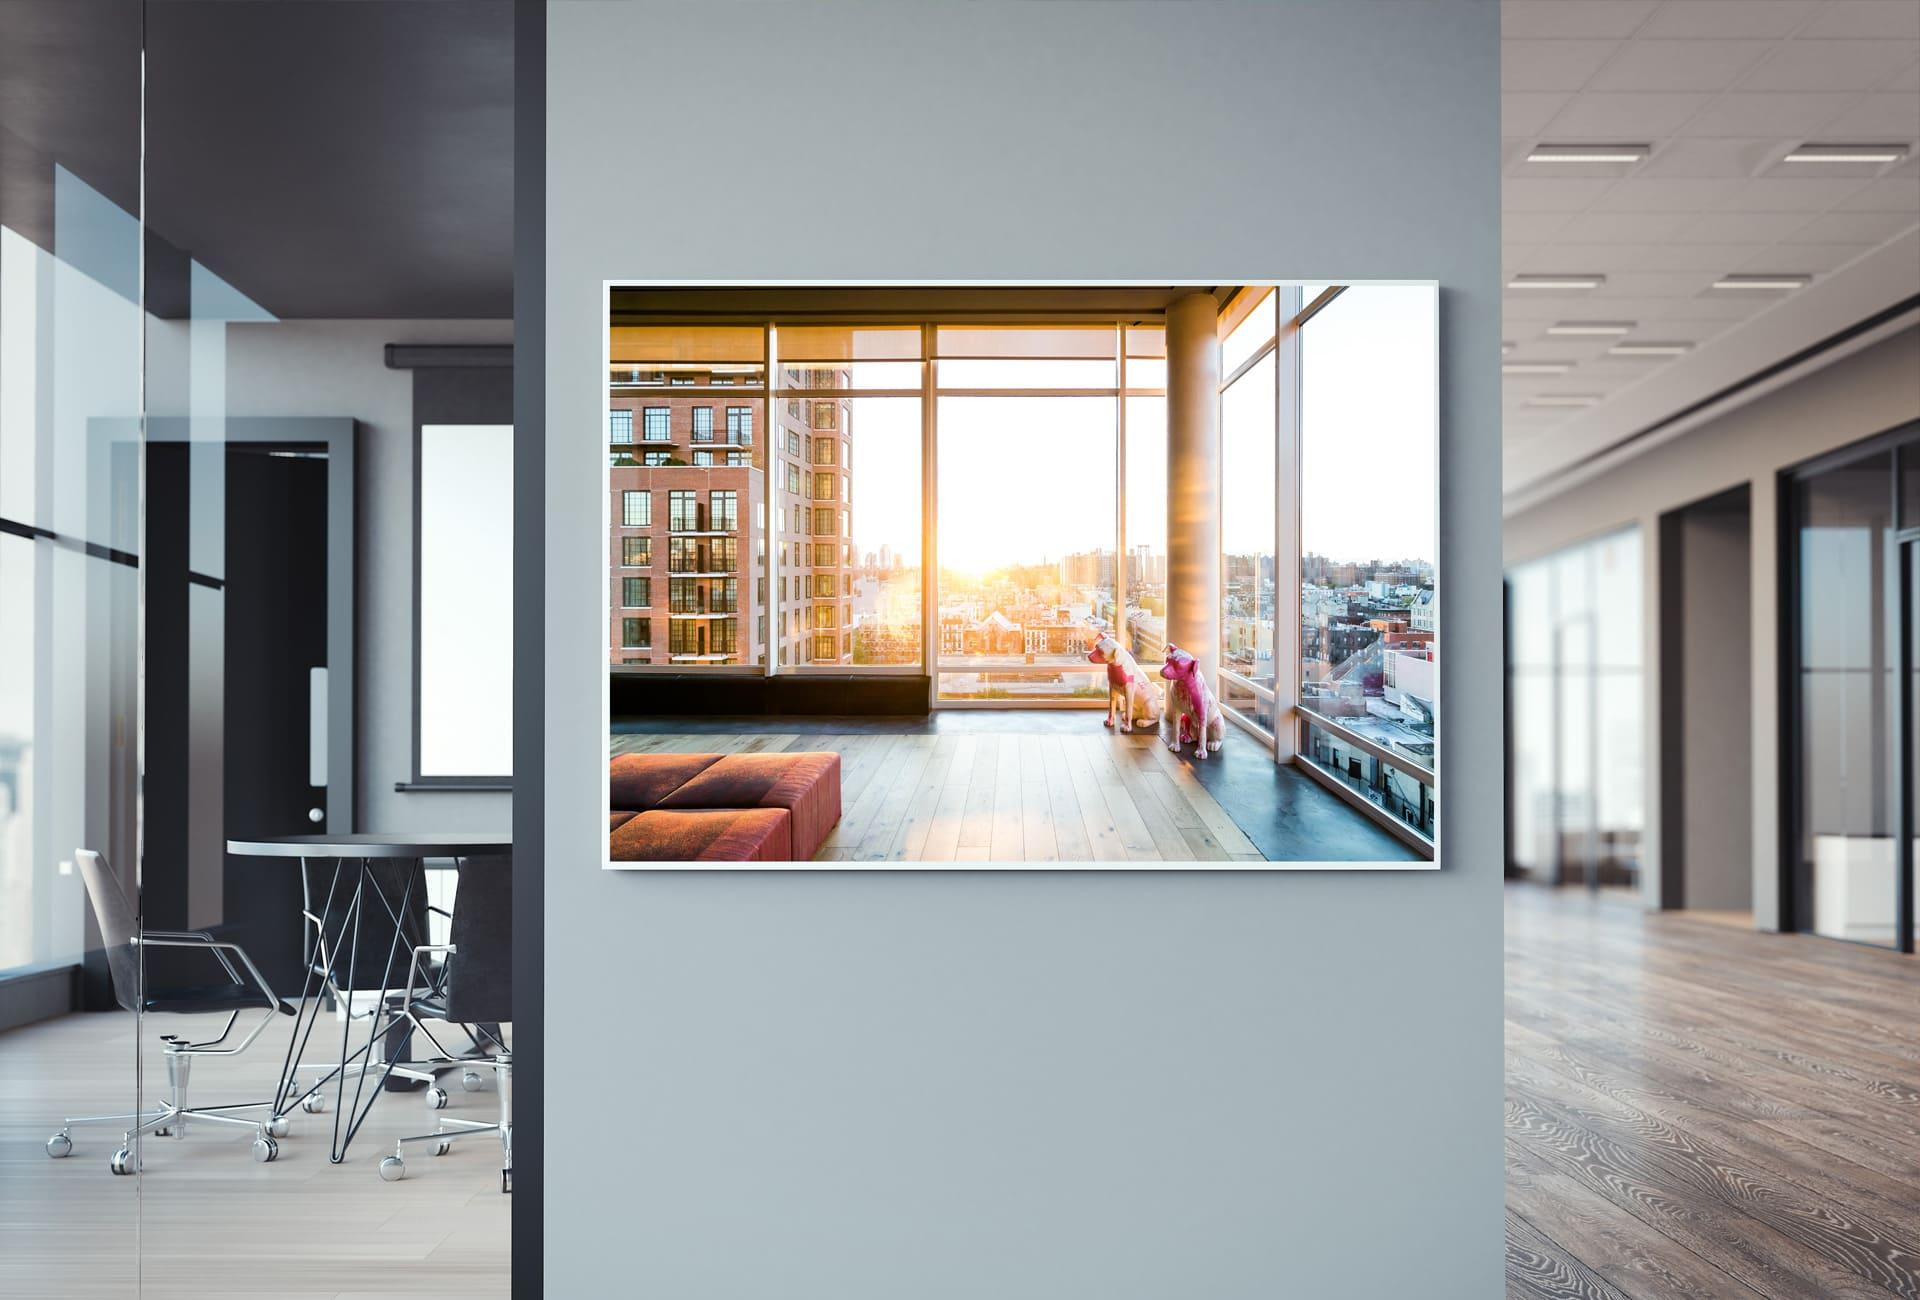 simoarts-com-simone-kessler-fotokunst-nuernberg-new-york-city-manhattan-loft-motiv1-milieu-02